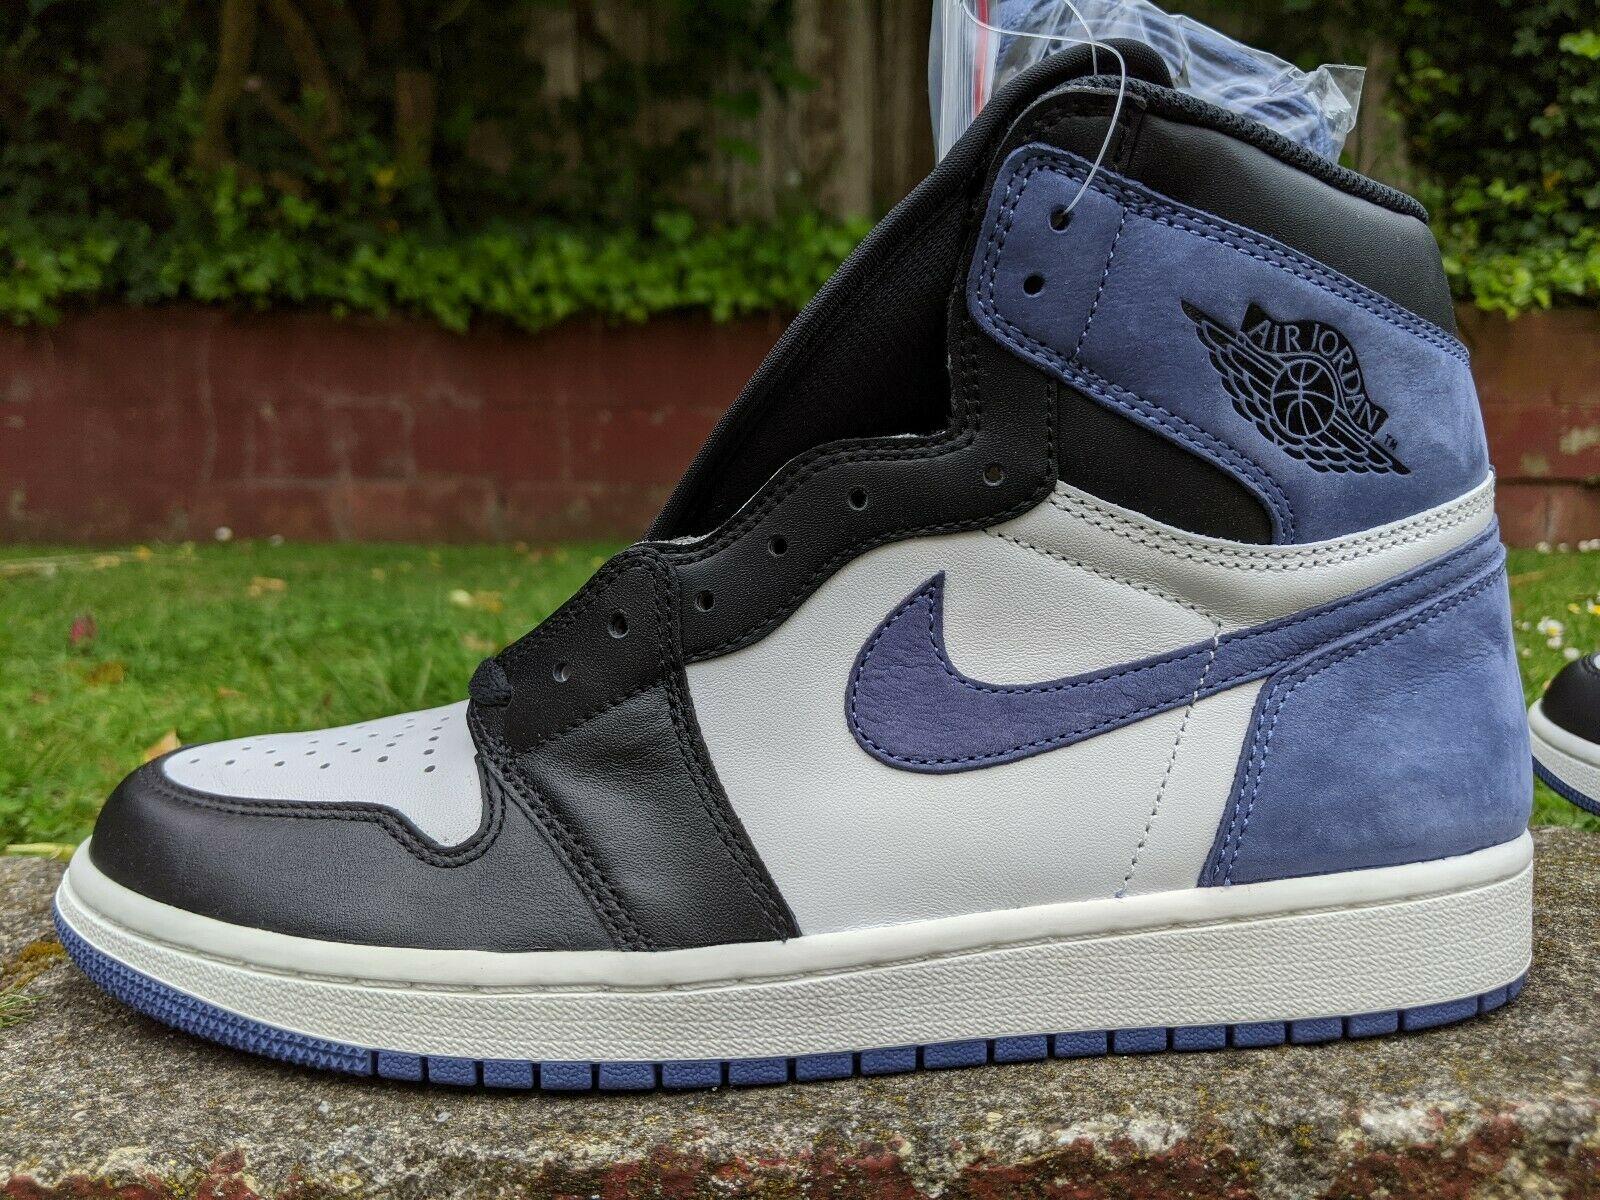 Jordan 1 Retro High Blue Moon